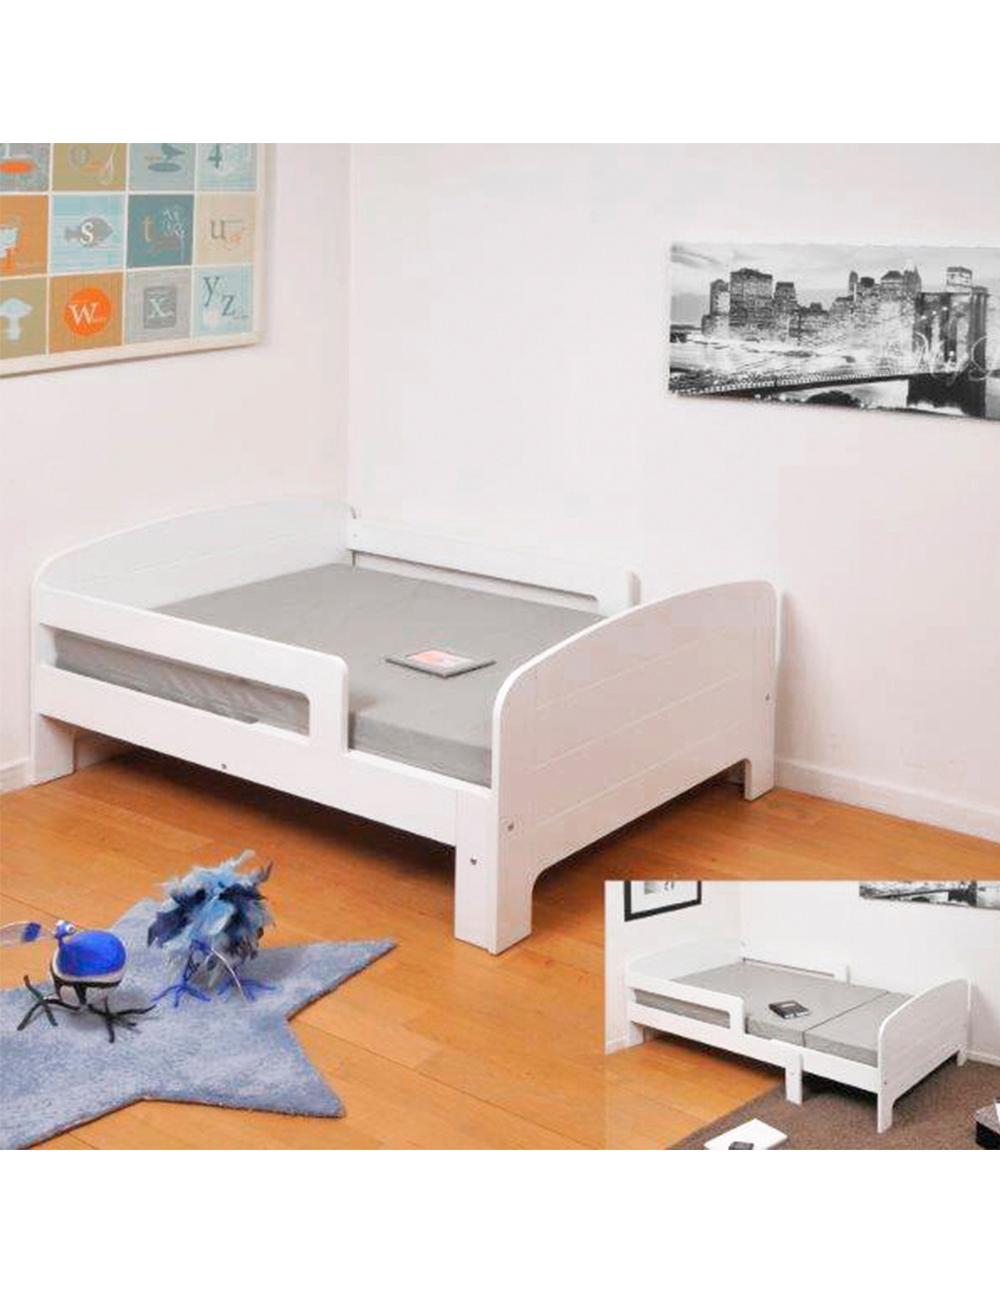 erweiterbares kinderbett mathias rosa. Black Bedroom Furniture Sets. Home Design Ideas